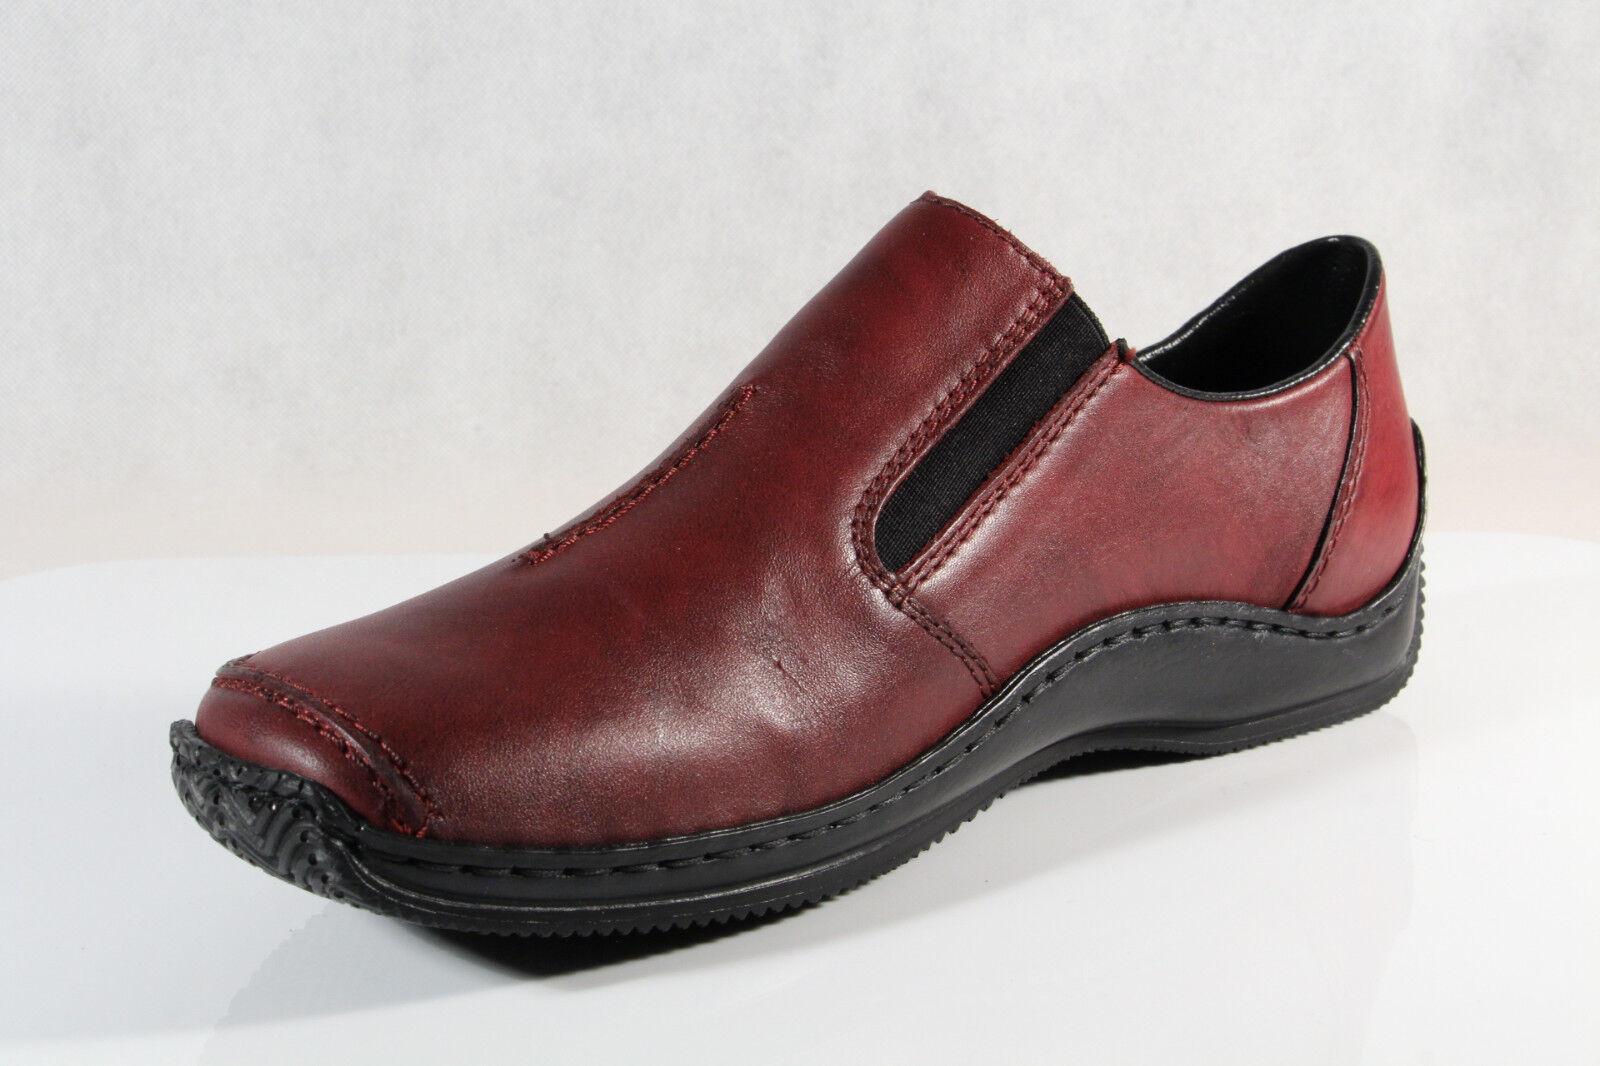 Rieker L1780 Schuhe Damen Halbschuhe Slipper , | real